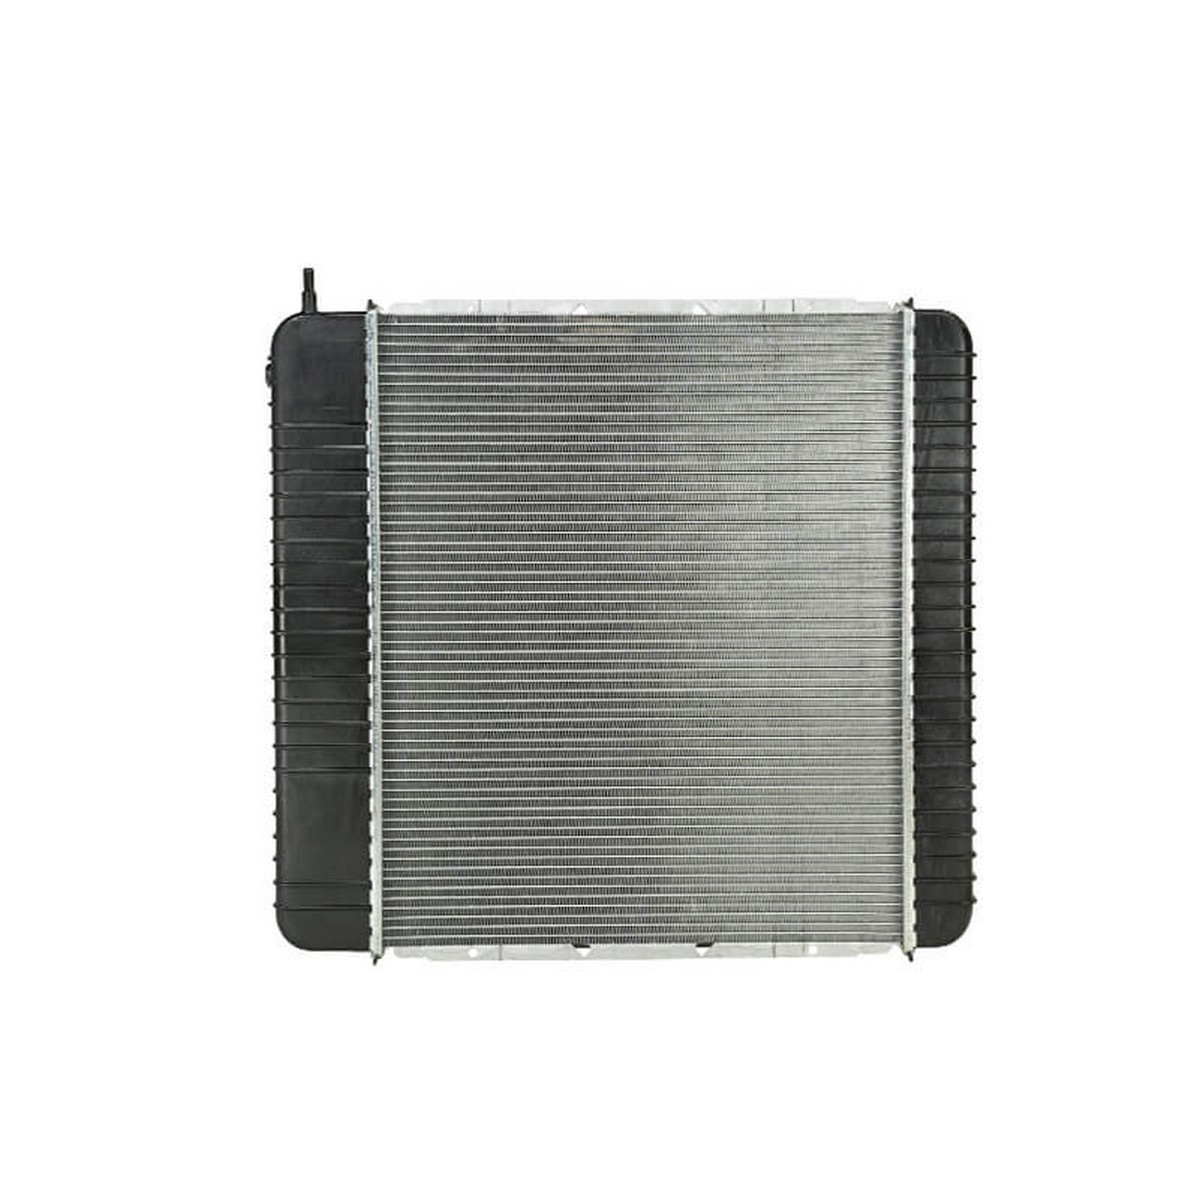 international 3000 7900 series 02 07 radiator oem 2509358c92 6